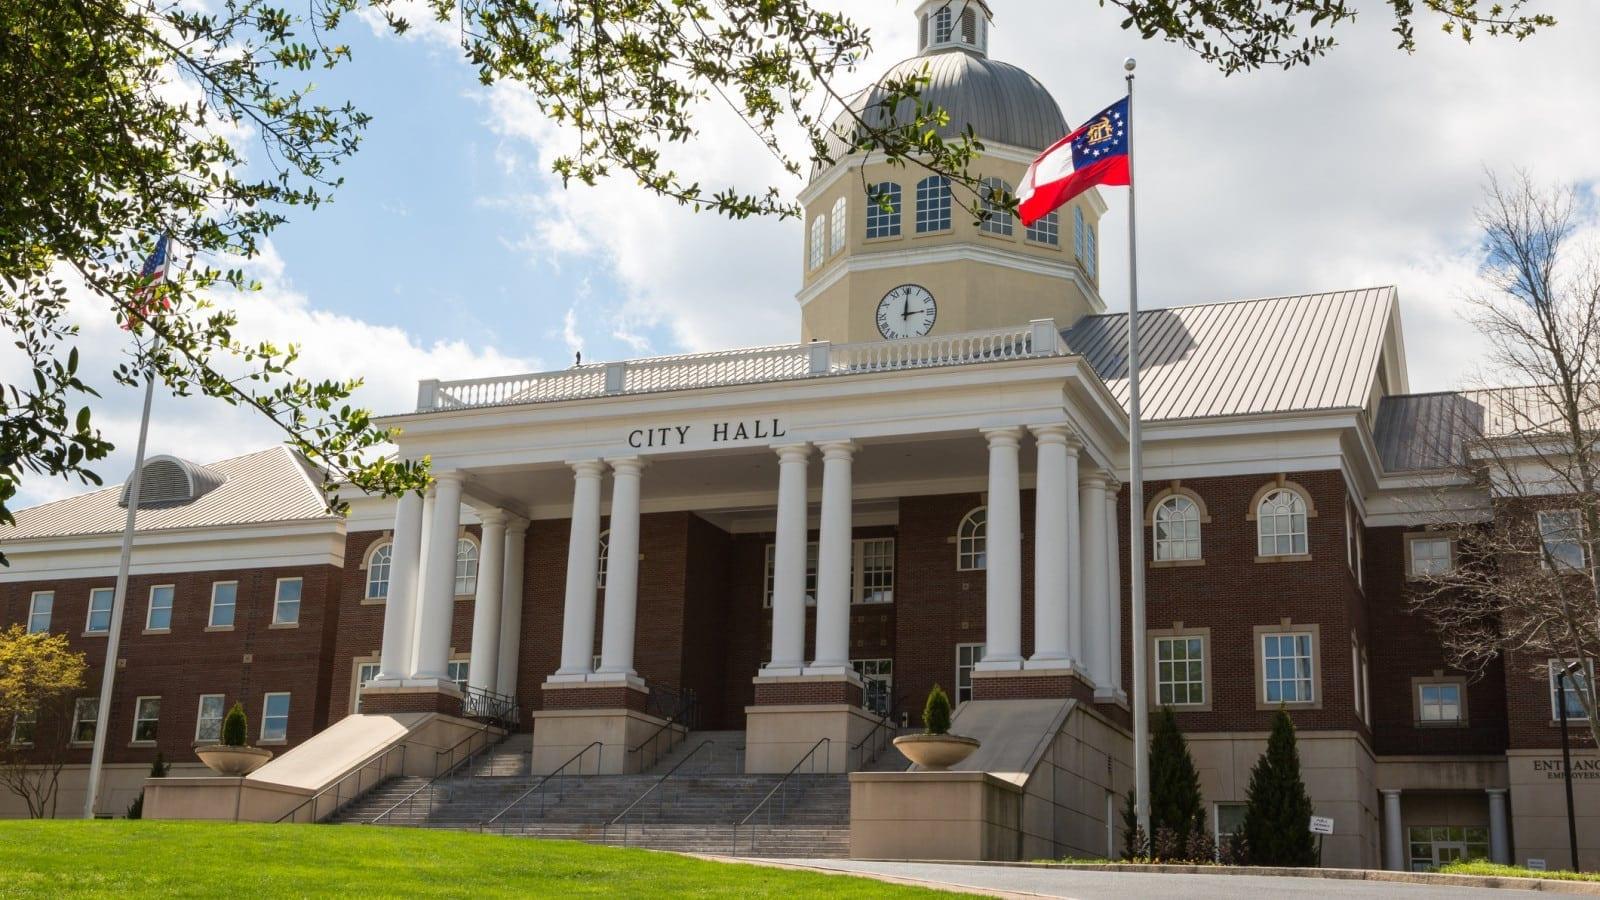 City Hall - Greensboro, North Carolina